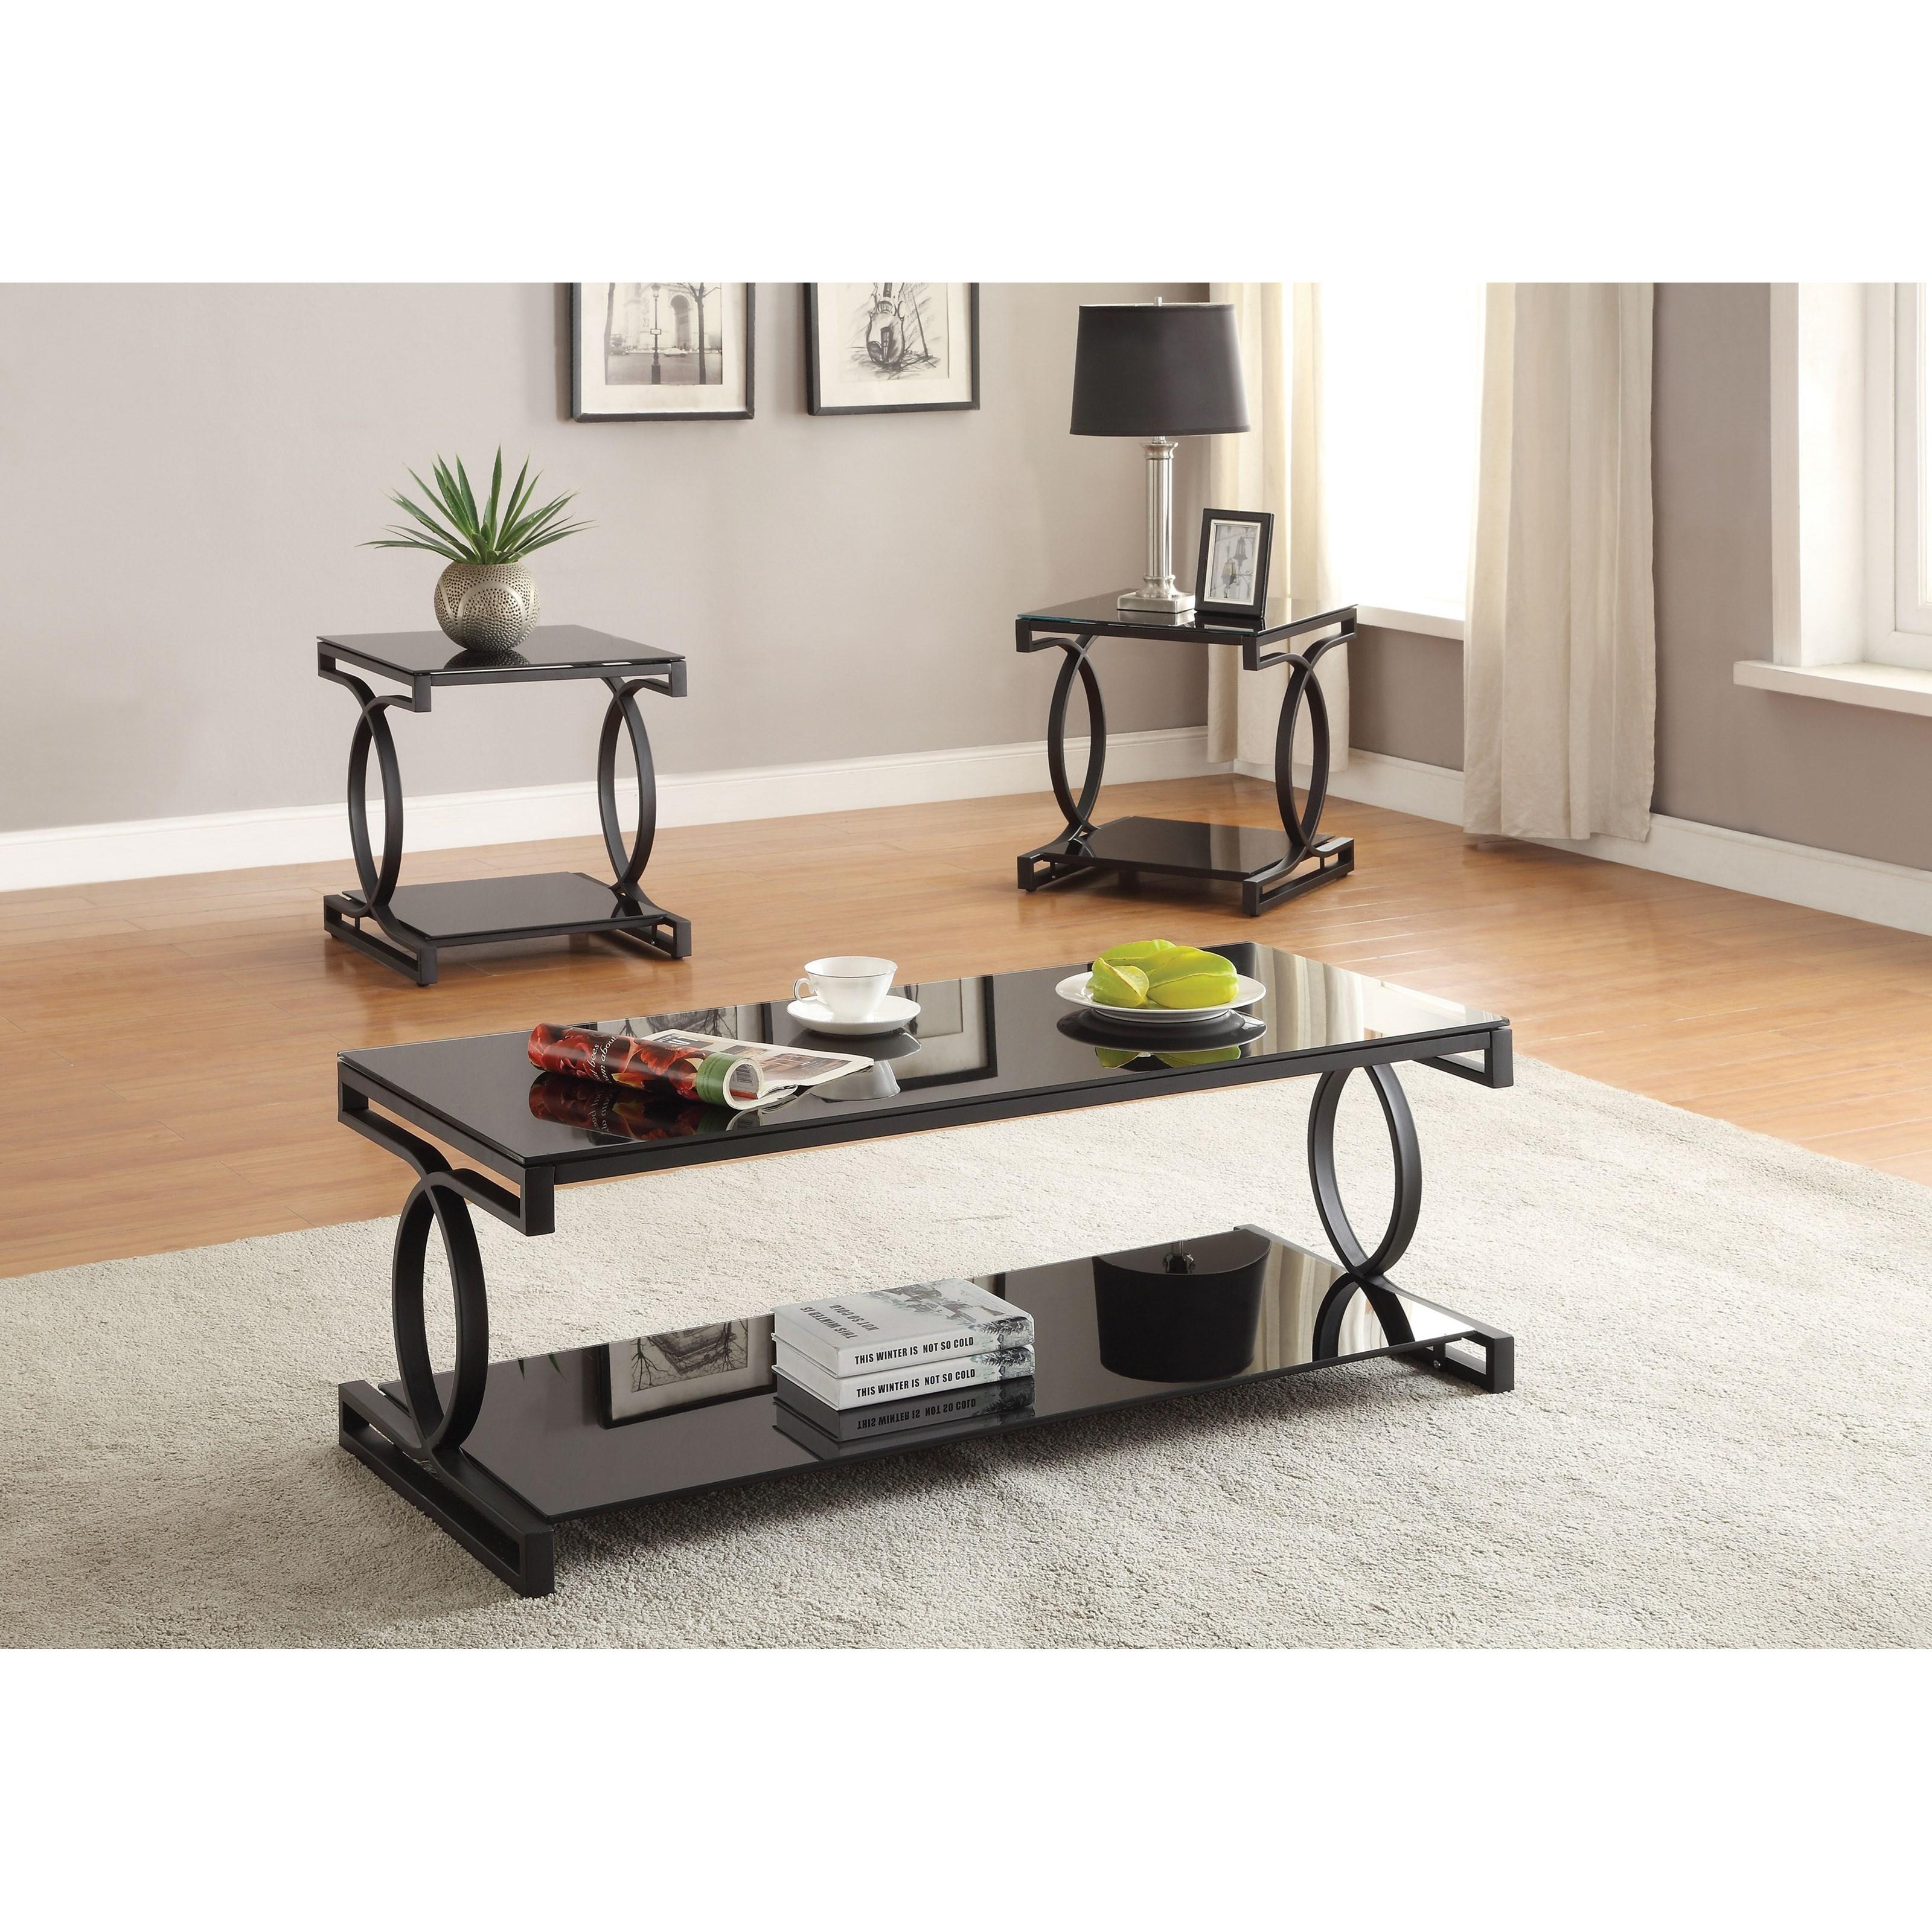 Milo Coffee/End Table Set (3Pc Pk) by Acme Furniture at Carolina Direct